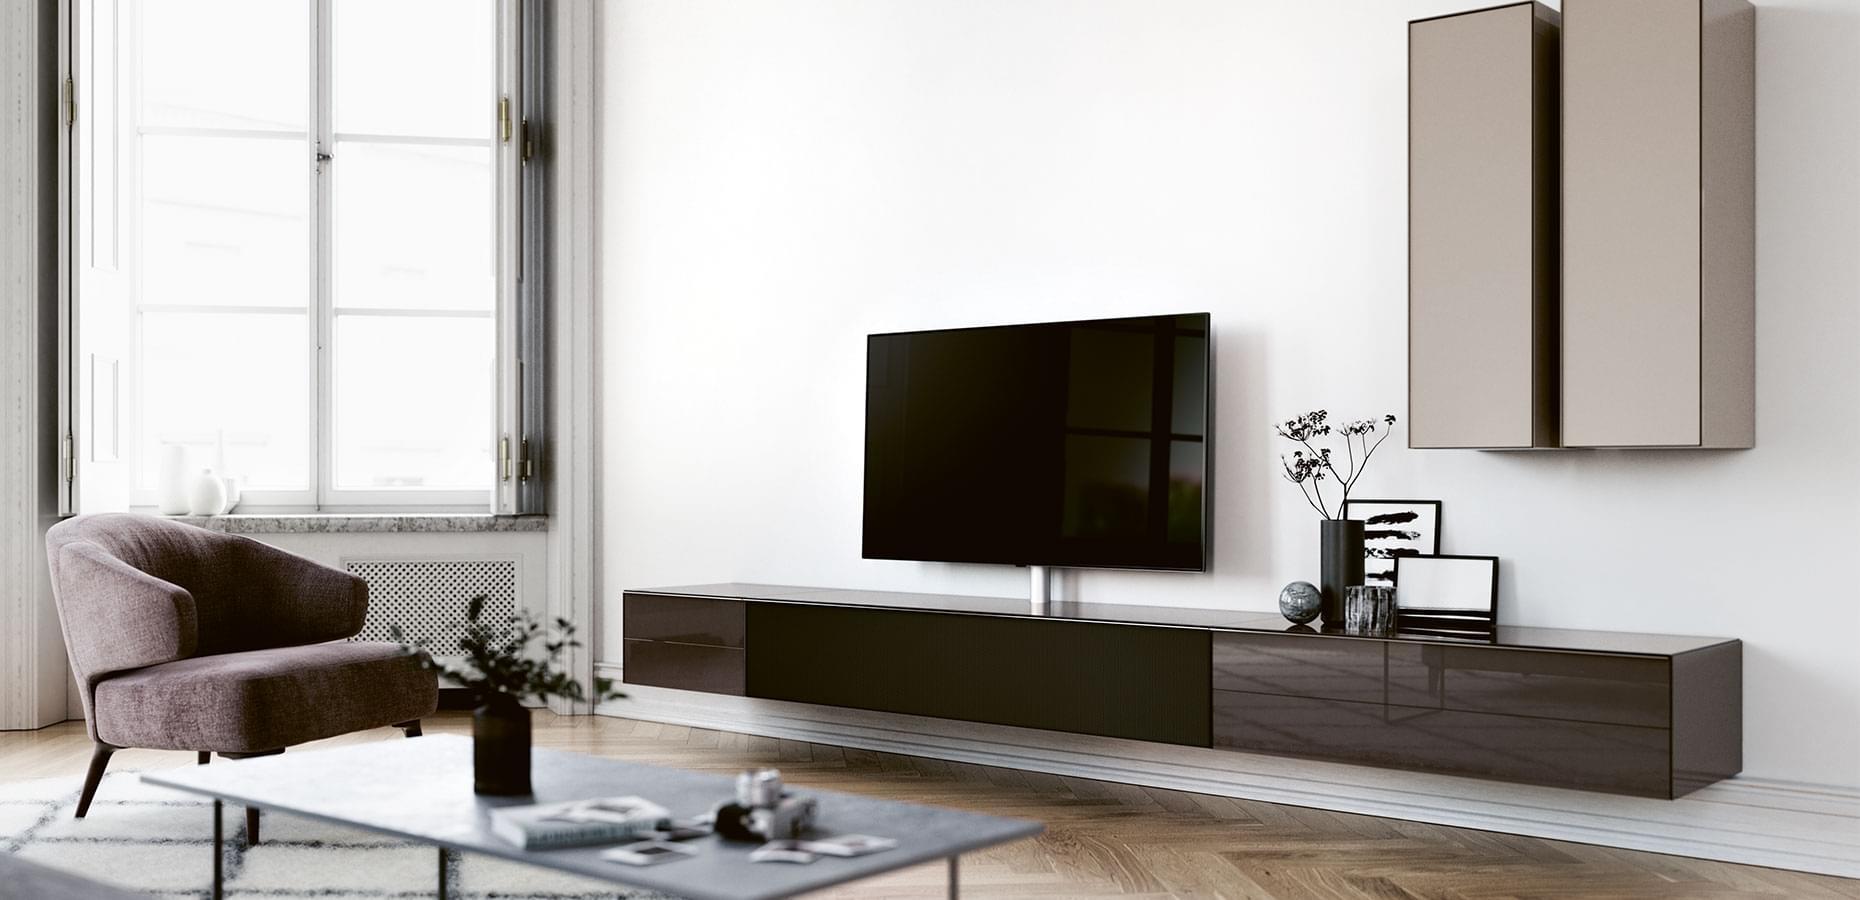 Spectral Scala Sc1651 Meuble Tv Cin Motion Luxembourg Hi Fi  # Meuble Tv Caisson